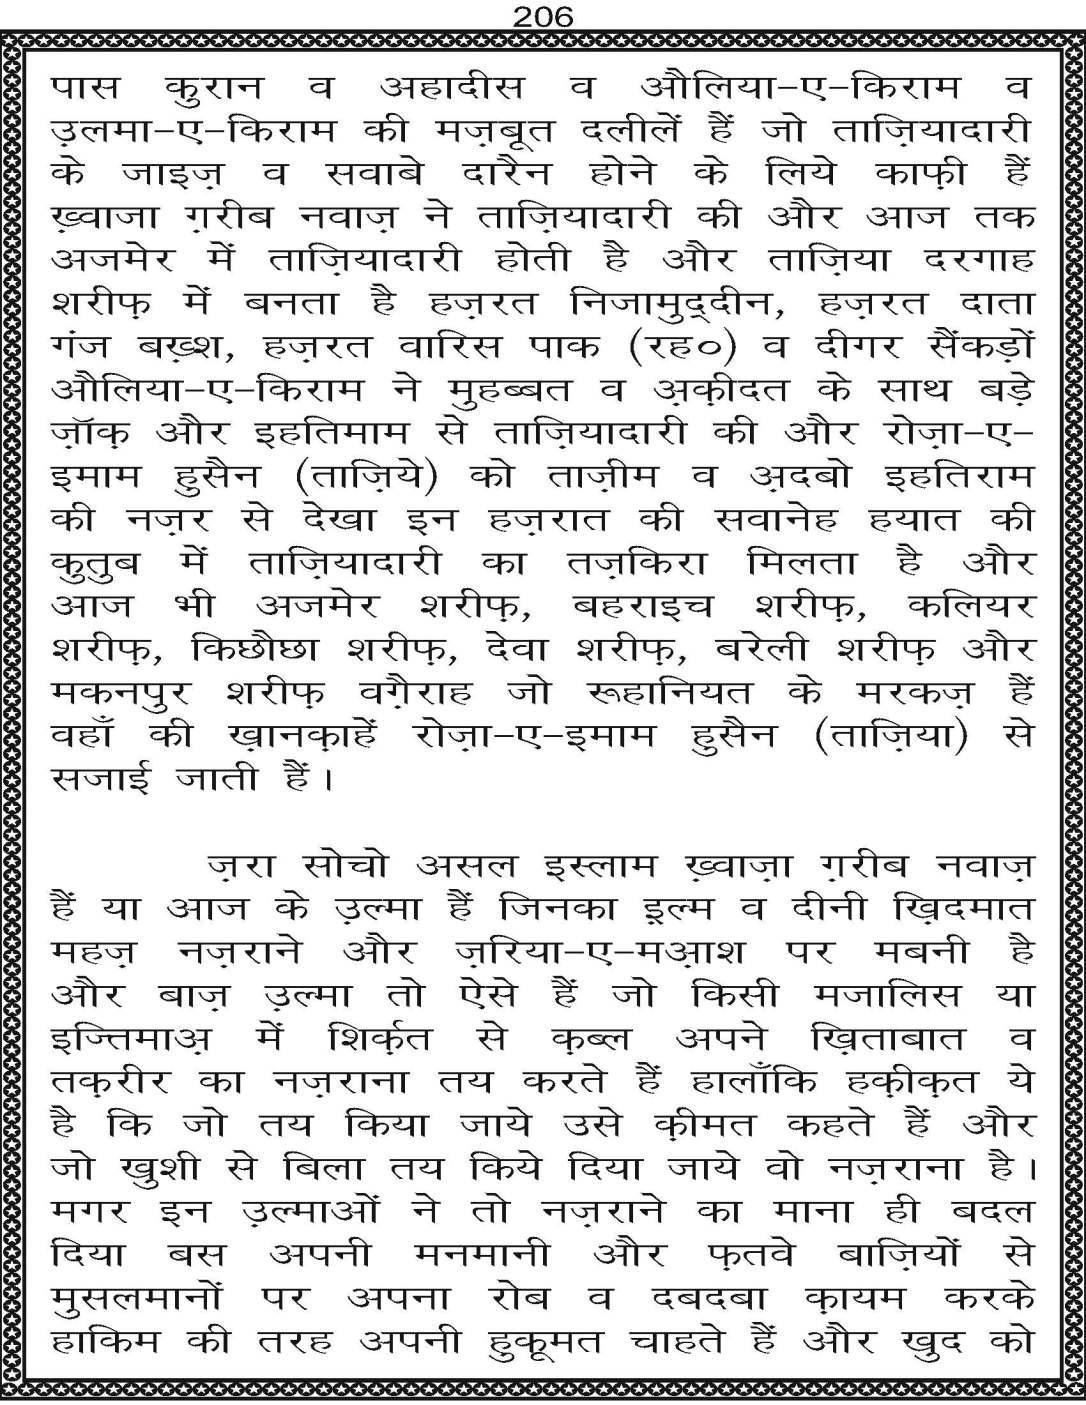 AzmateTaziyadari_Page_206